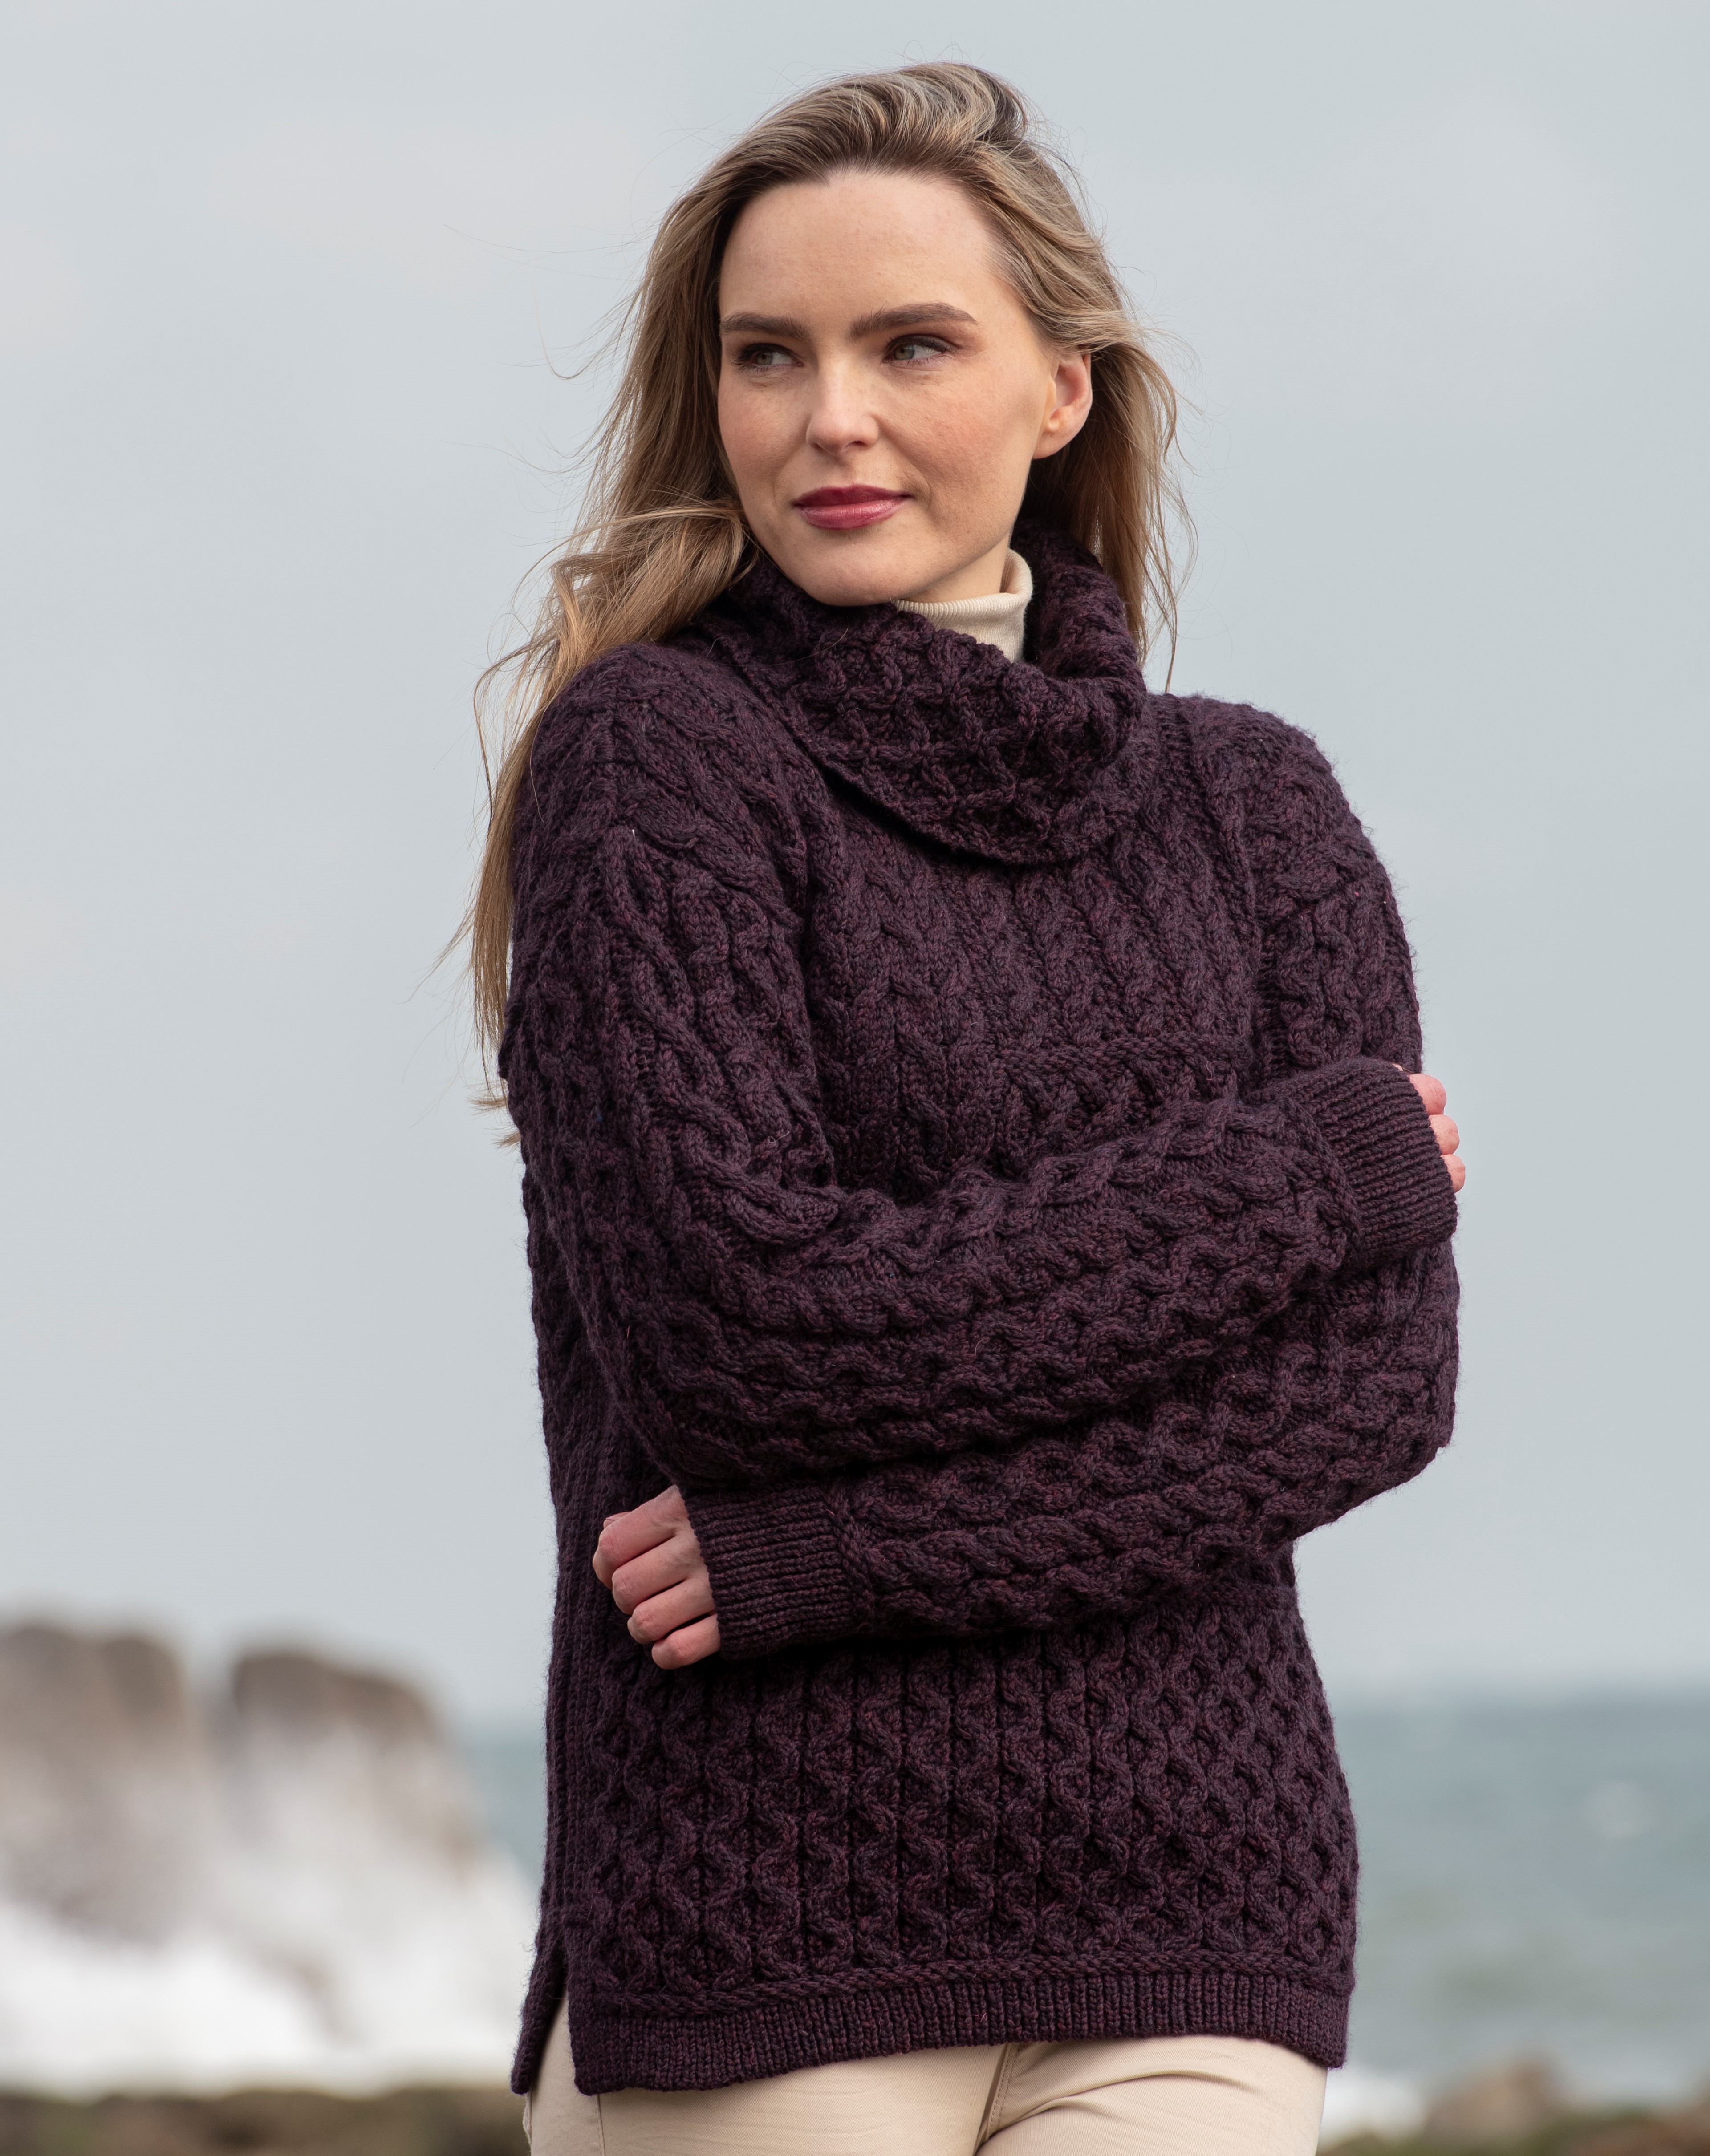 Cowl Neck Patchwork Sweater Plum N113 Nua Super Soft Merino Wool Made in Ireland